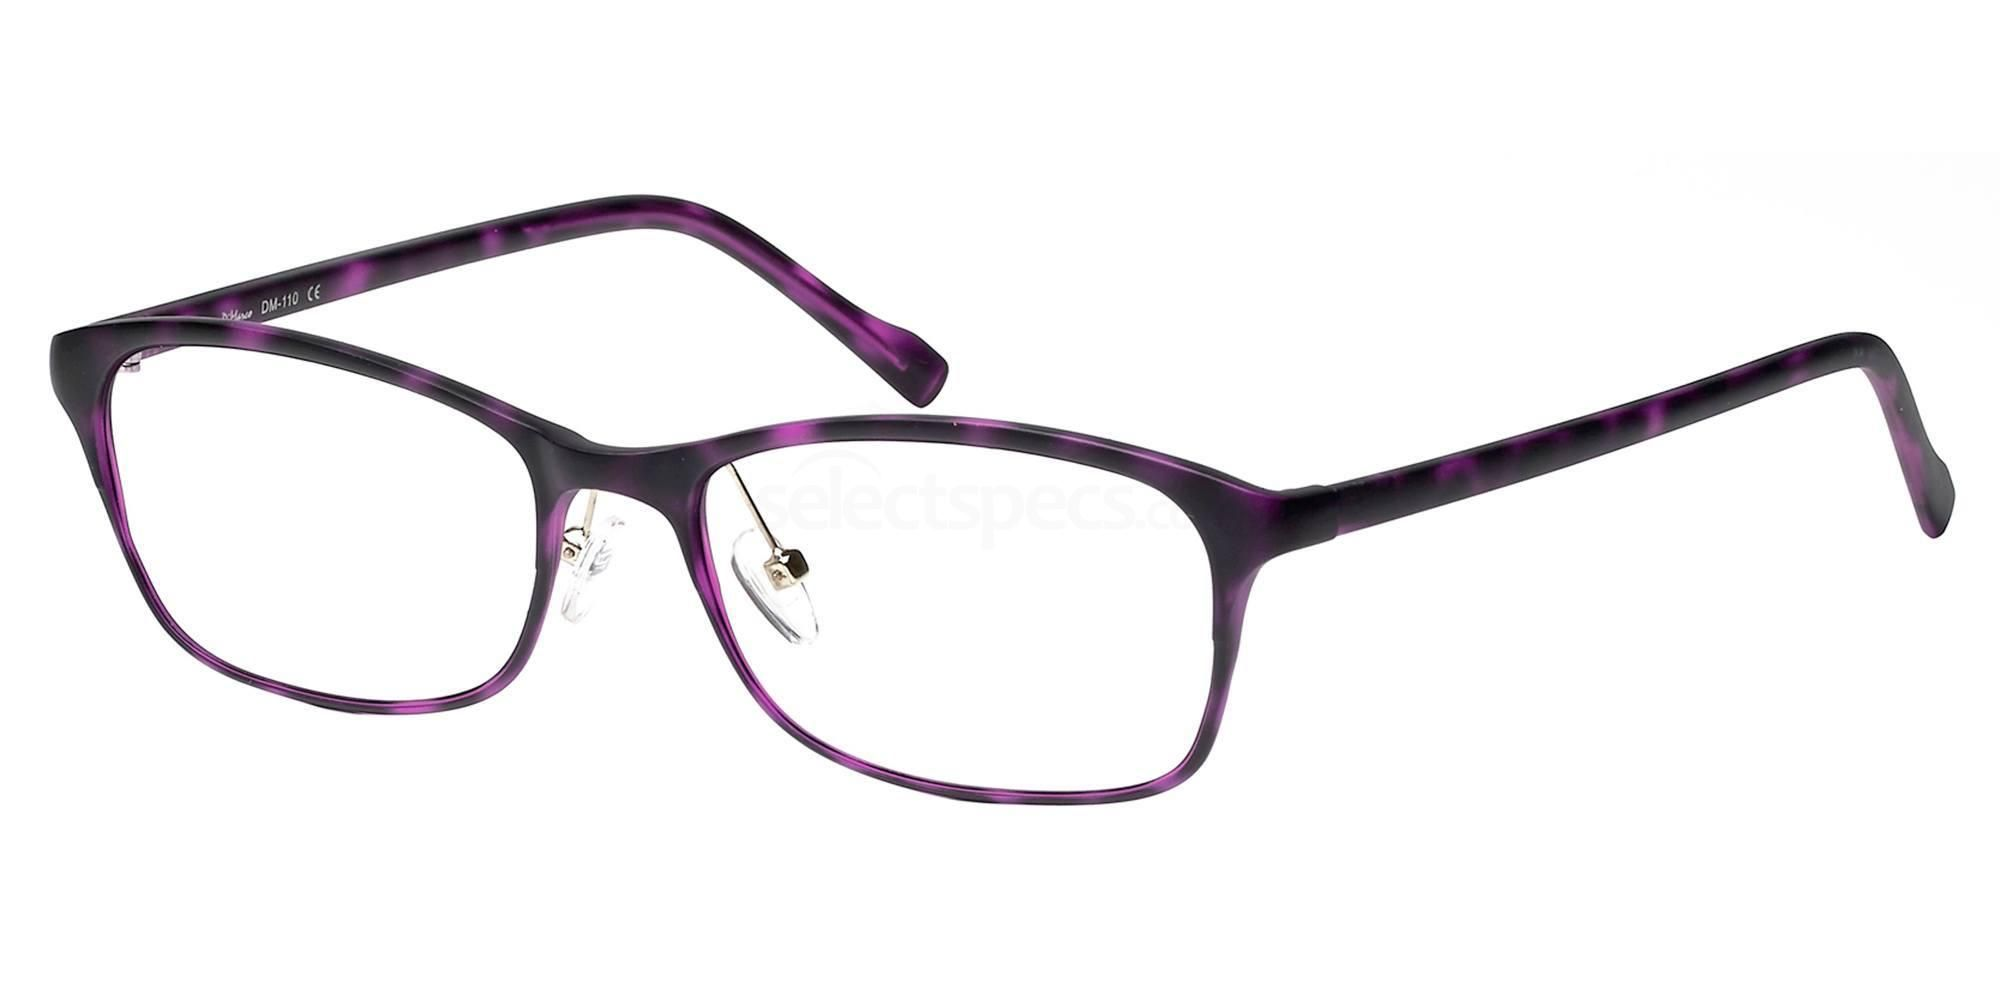 DiMarco DM110 glasses. Free lenses   SelectSpecs